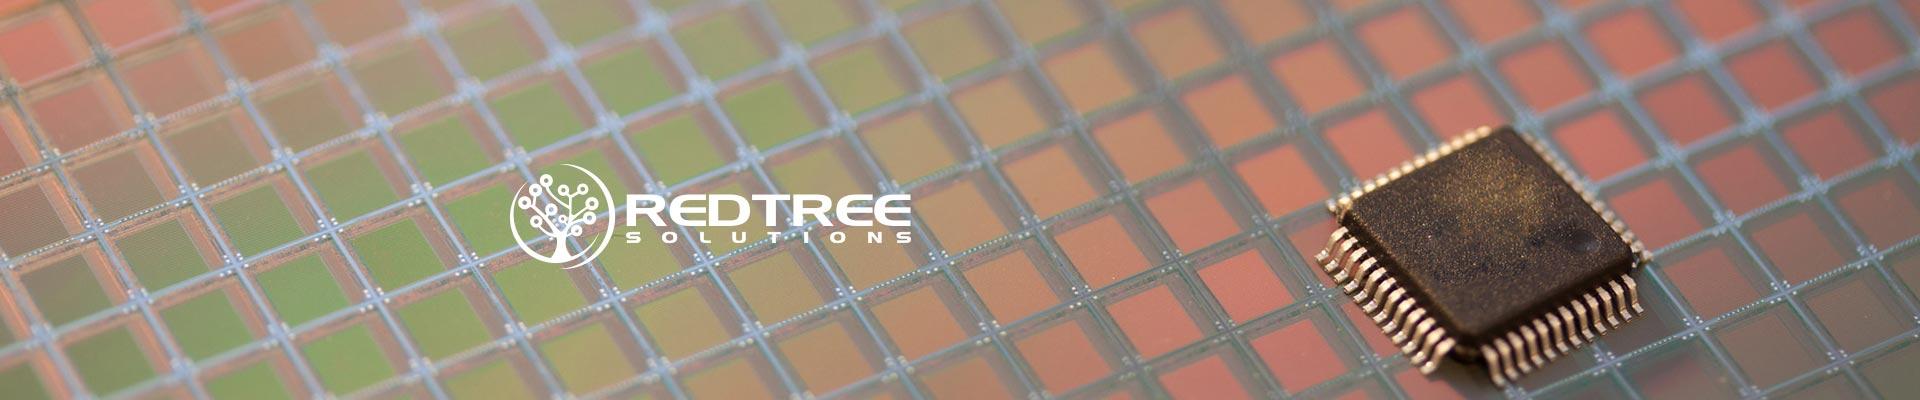 s-redtree-asics-foundry-services